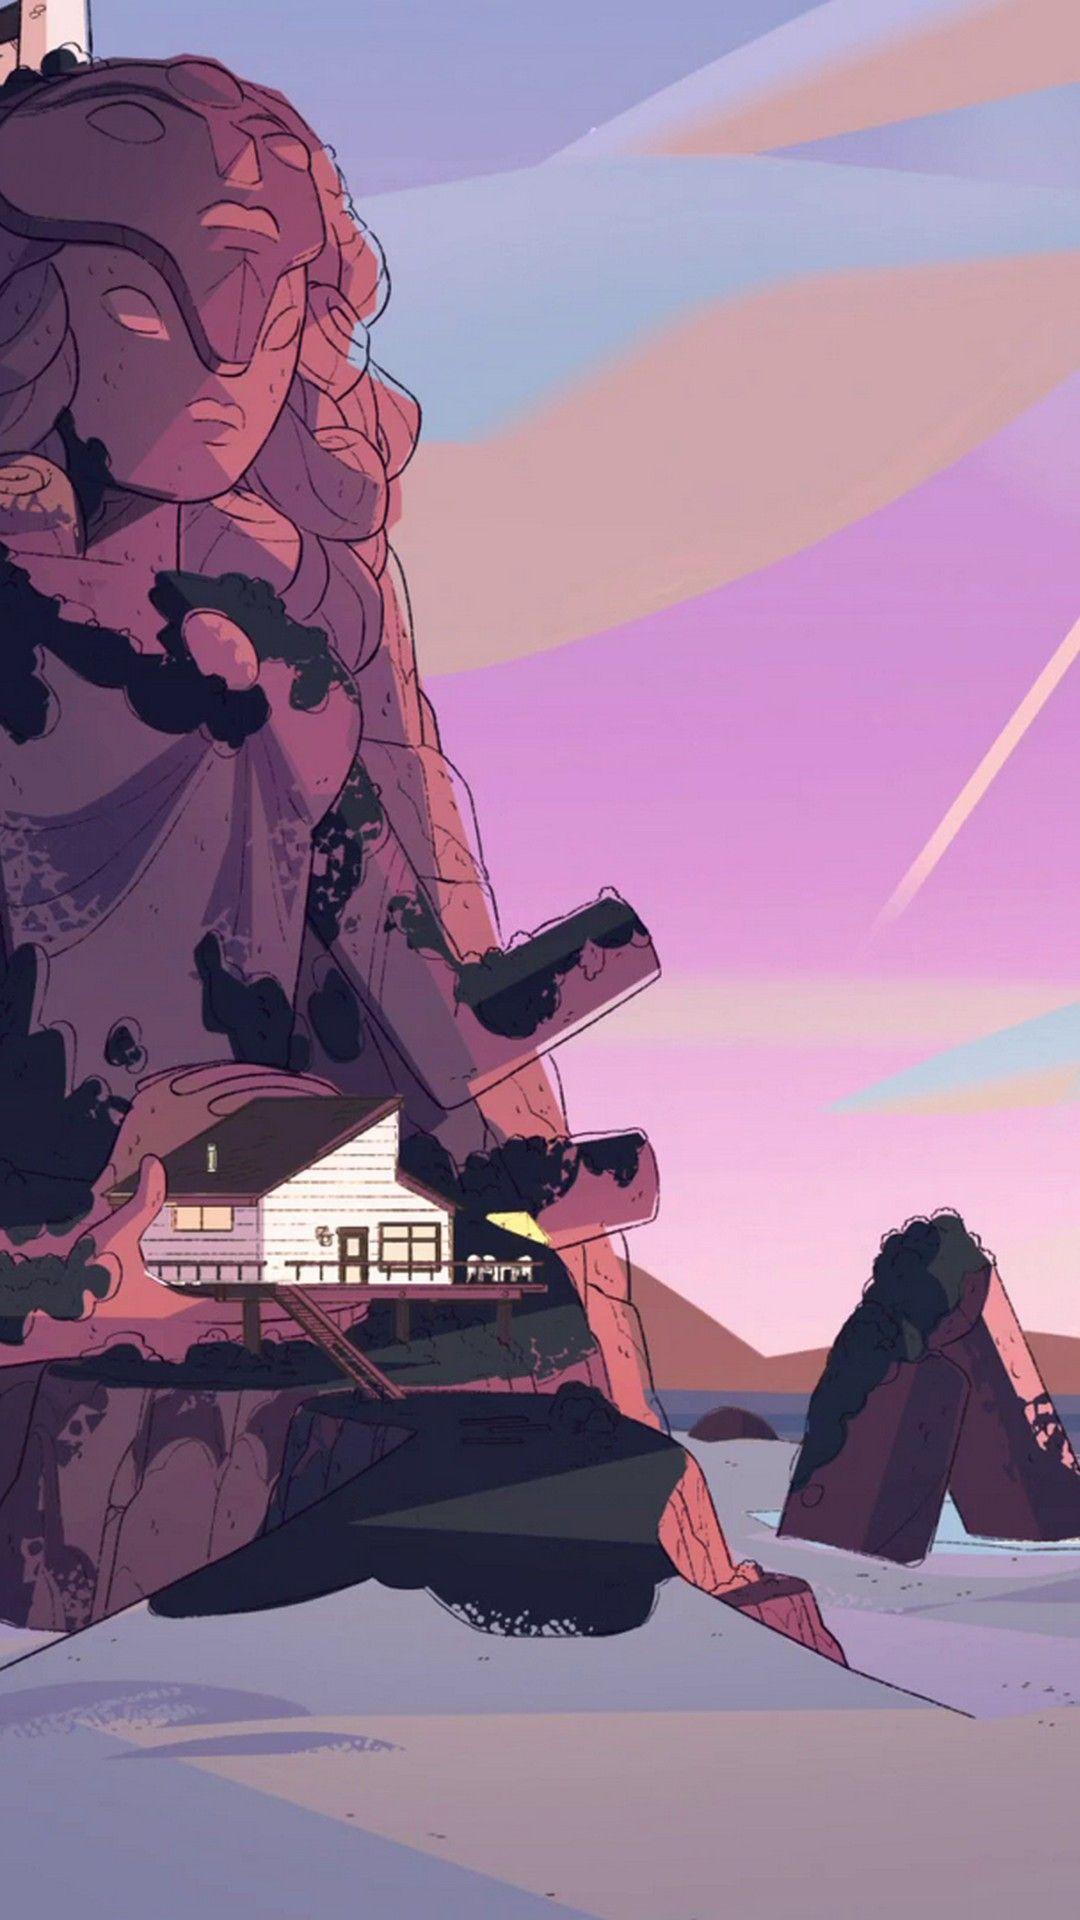 Aesthetic Steven Universe Wallpapers - Wallpaper Cave